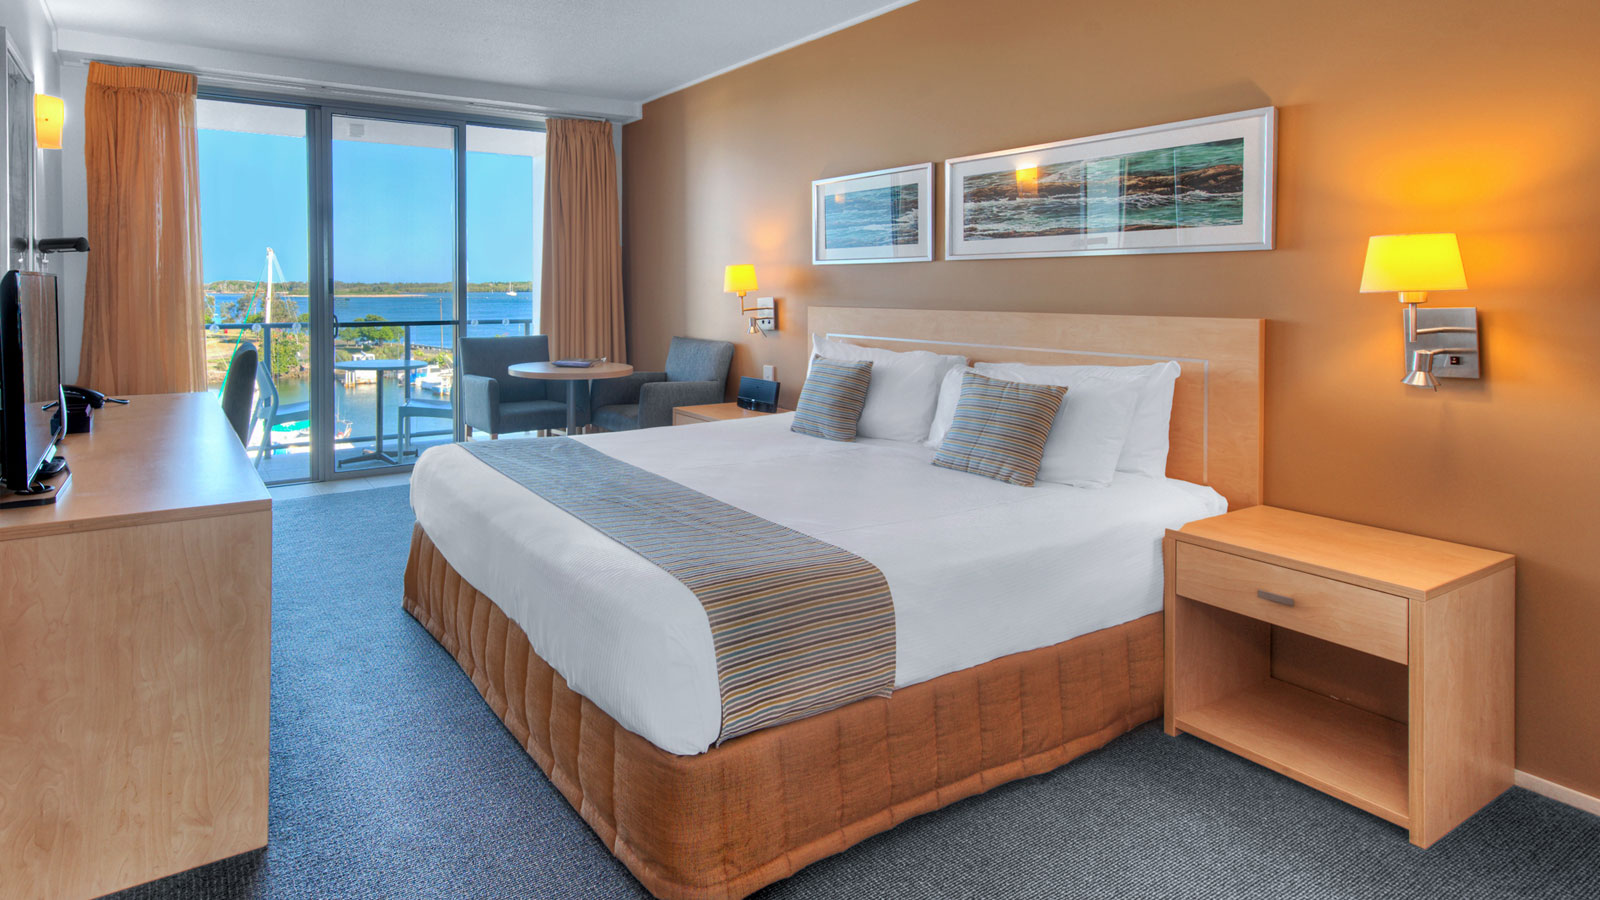 ballina hotel spa rooms accommodation ramada hotel. Black Bedroom Furniture Sets. Home Design Ideas